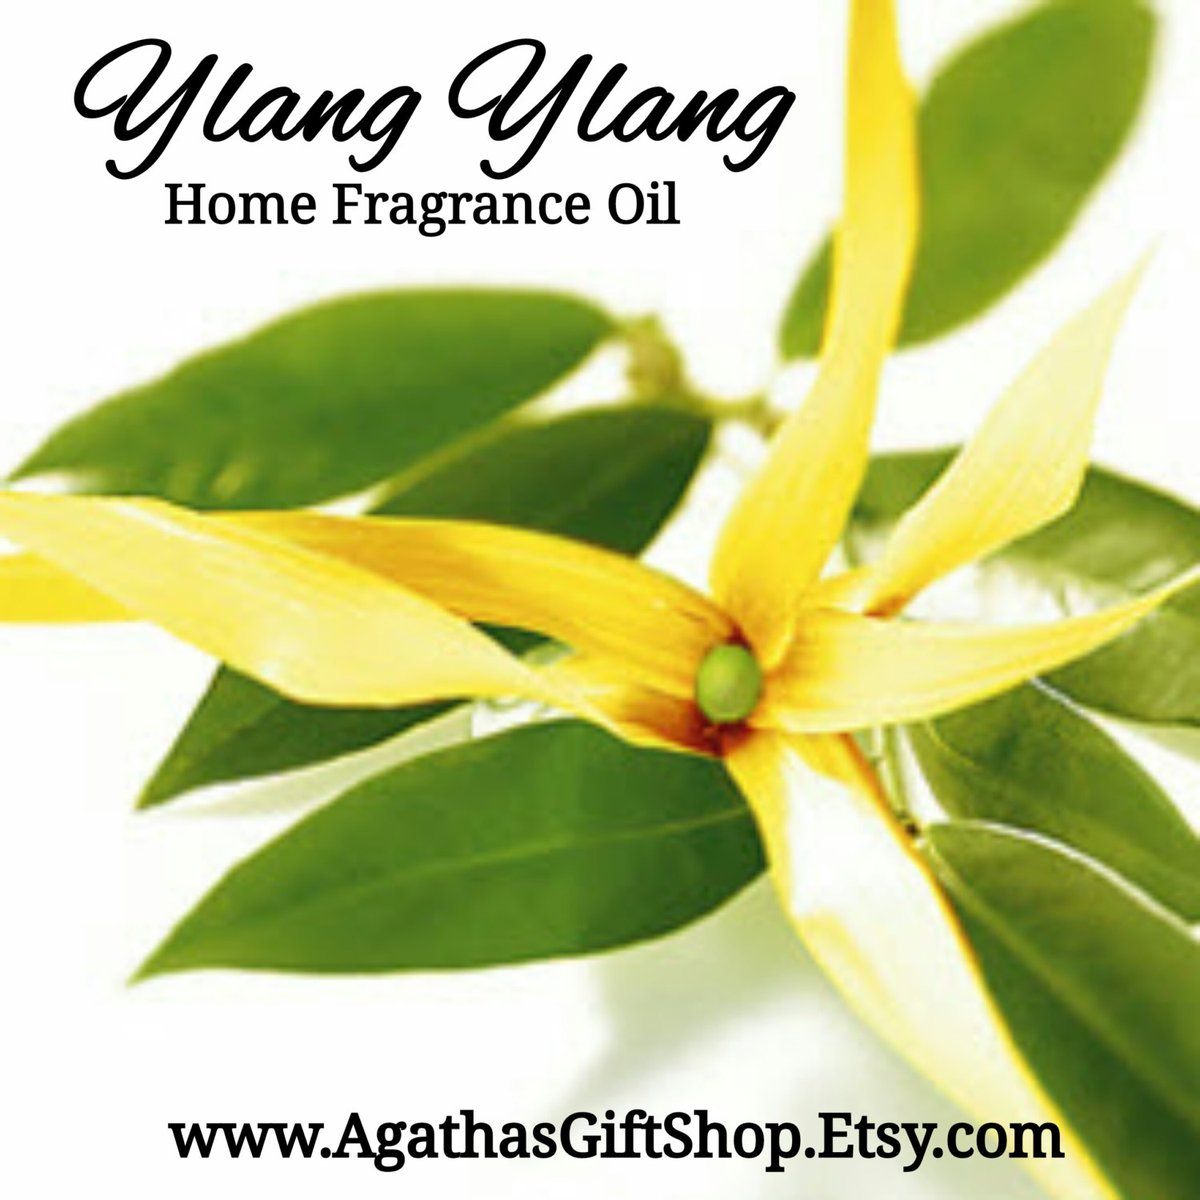 Ylang Ylang Home Fragrance Diffuser Warmer Aromatherapy Burning Oil  #HomeFragranceOil #BlackFriday #HerbalRemedies #GiftShopSale #Wedding #CyberMonday #PerfumeBodyOils #Etsy #AromatherapyOil #Incense #UpliftingScents